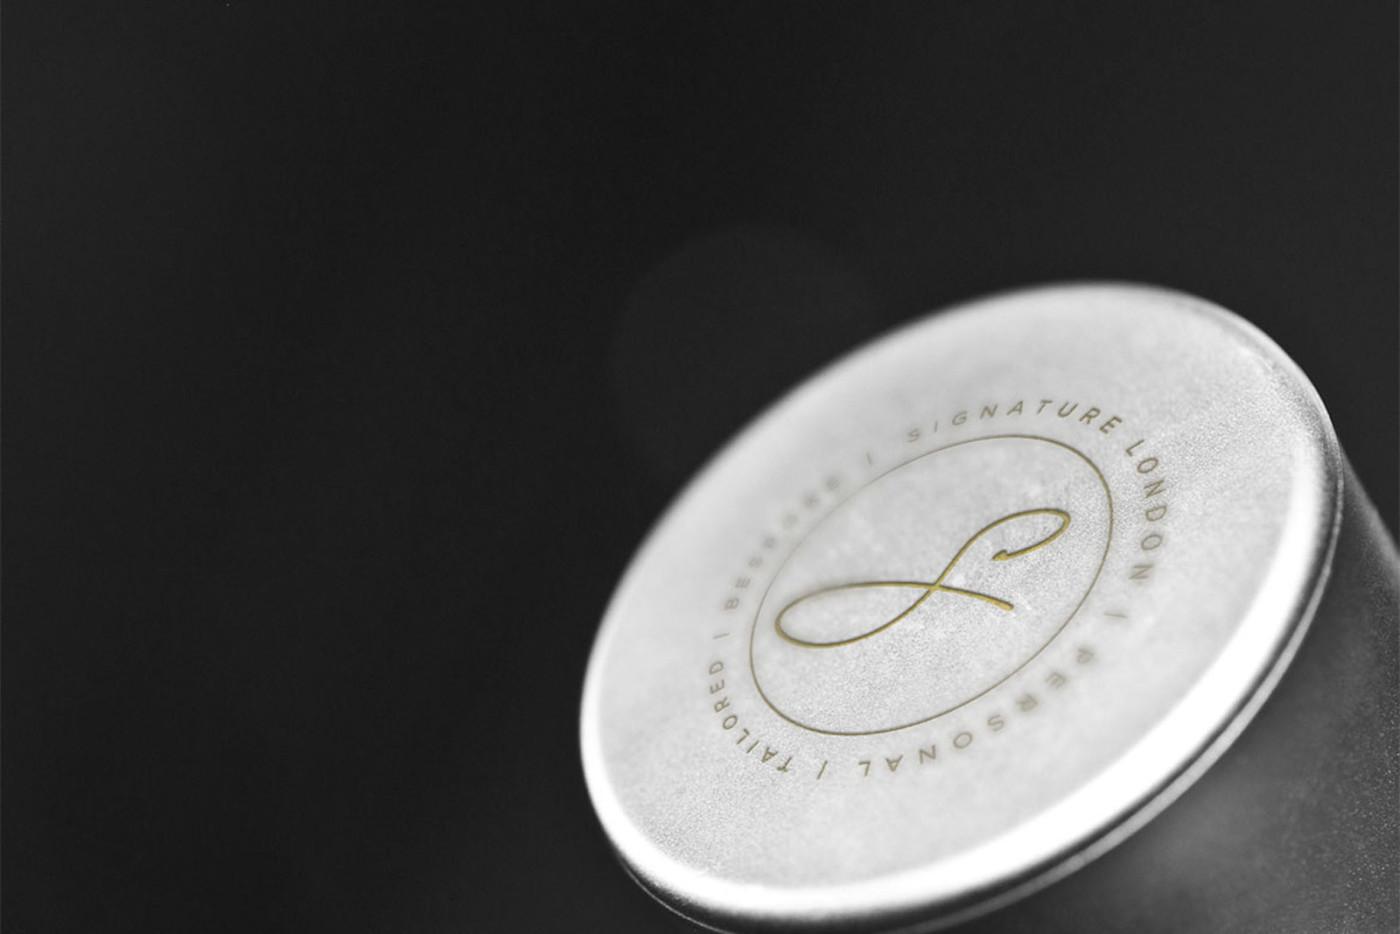 luxury-brand-identity-design-london08